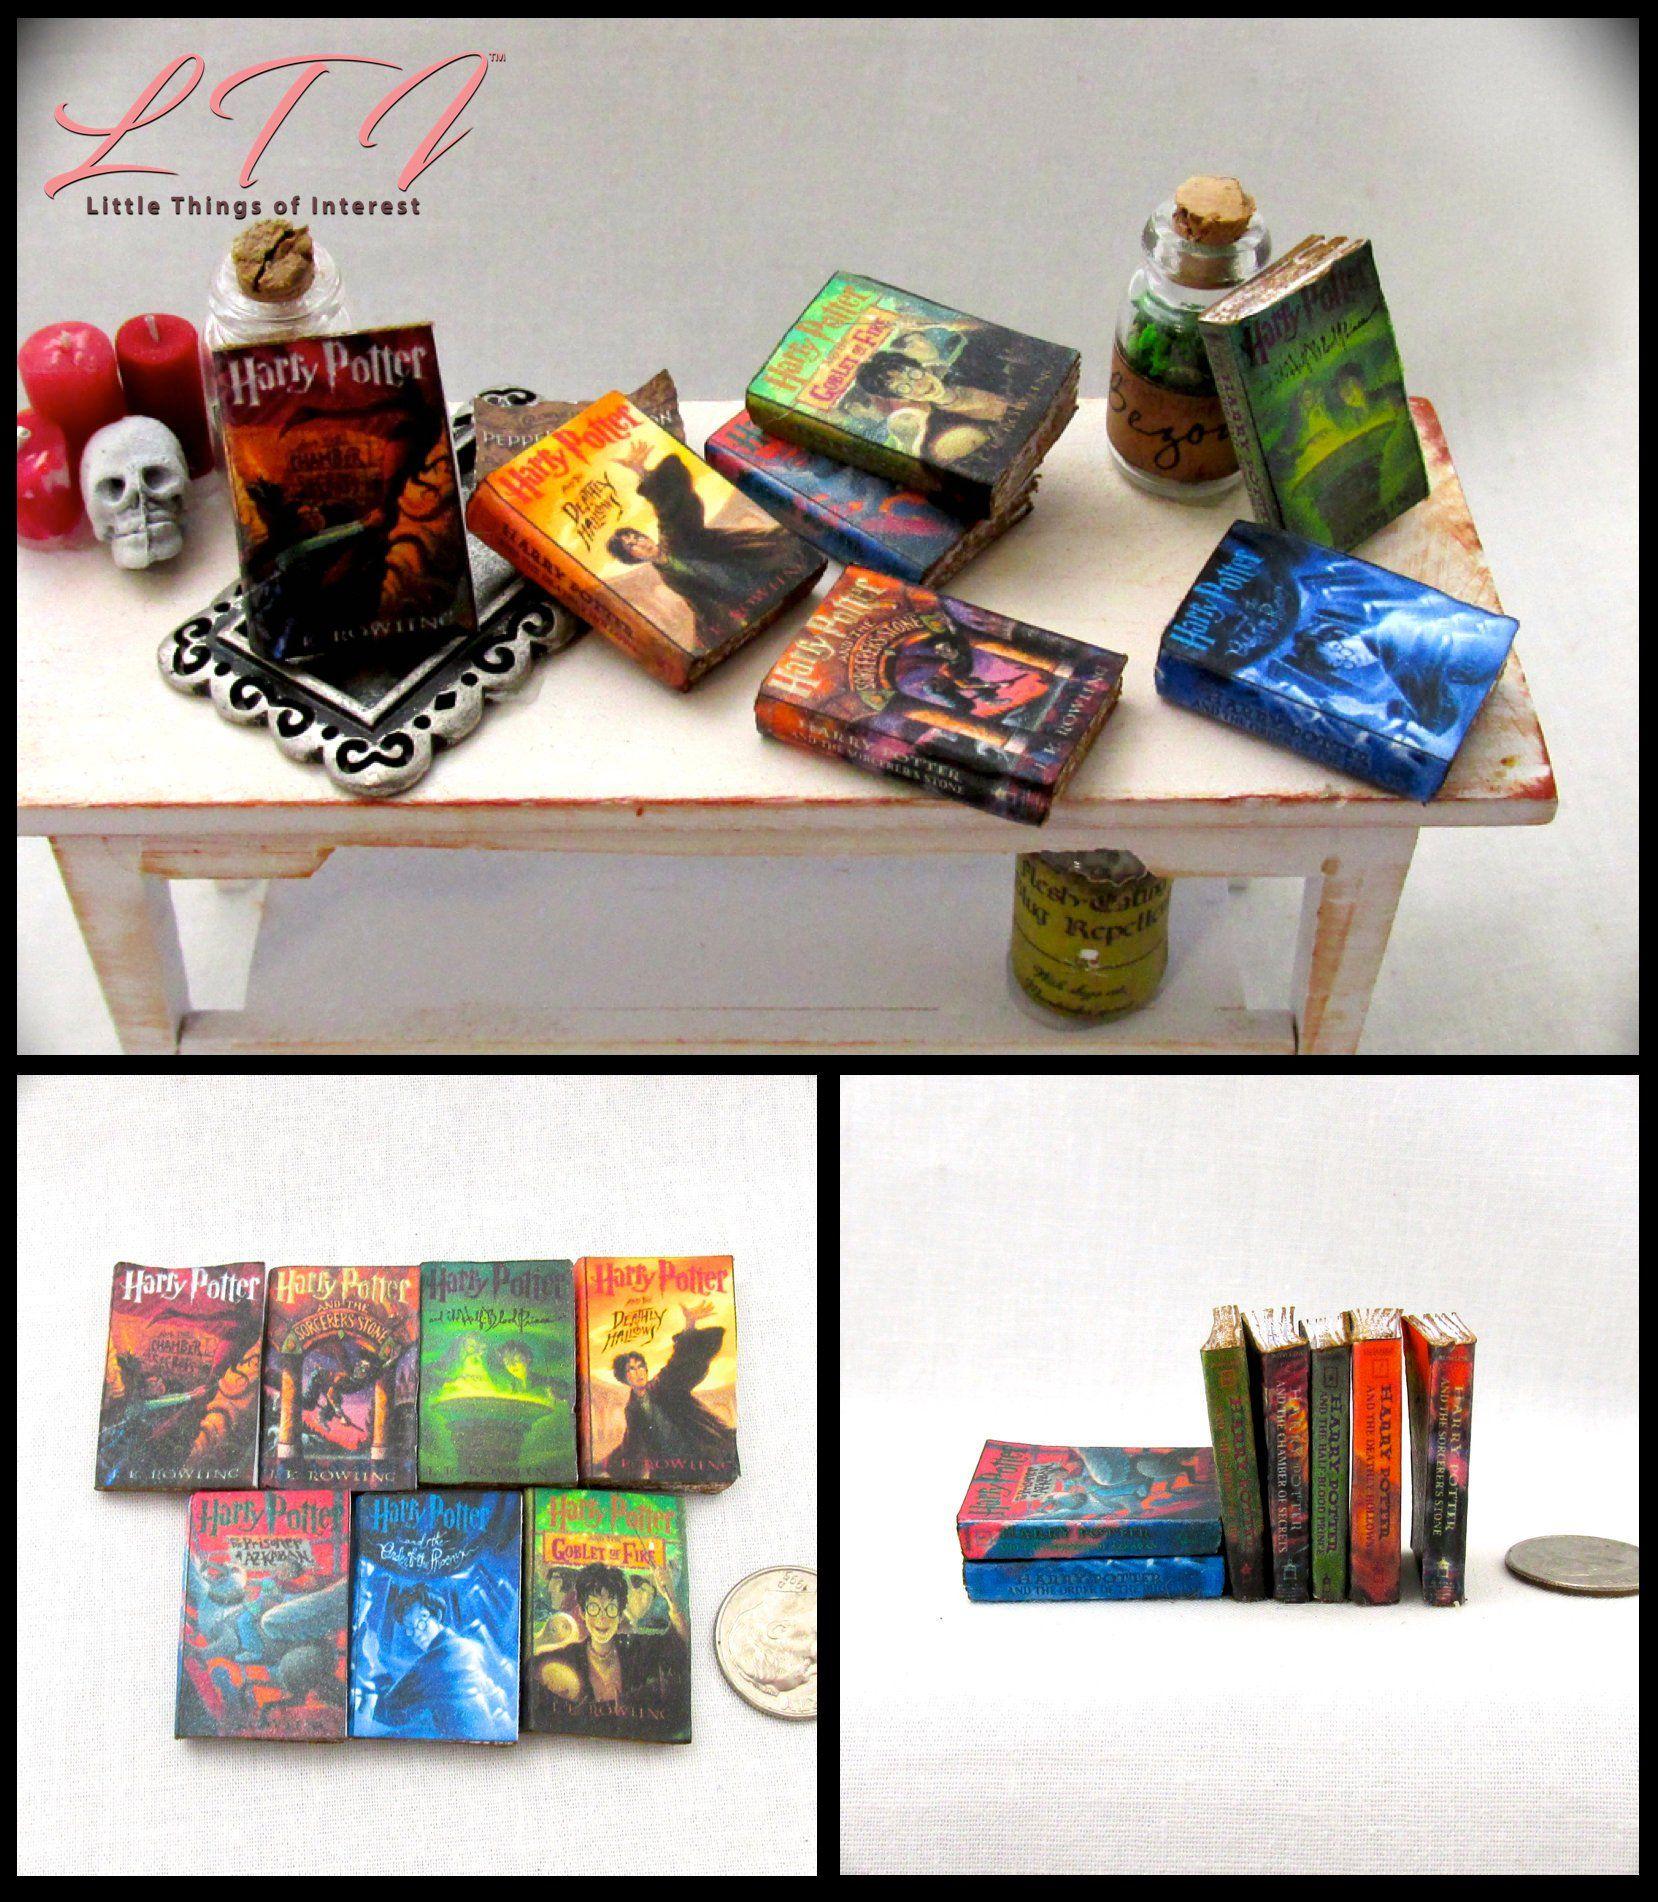 7 HOGWARTS TEXTBOOKS Dollhouse Miniature Prop Wooden Books HARRY POTTER 1:12